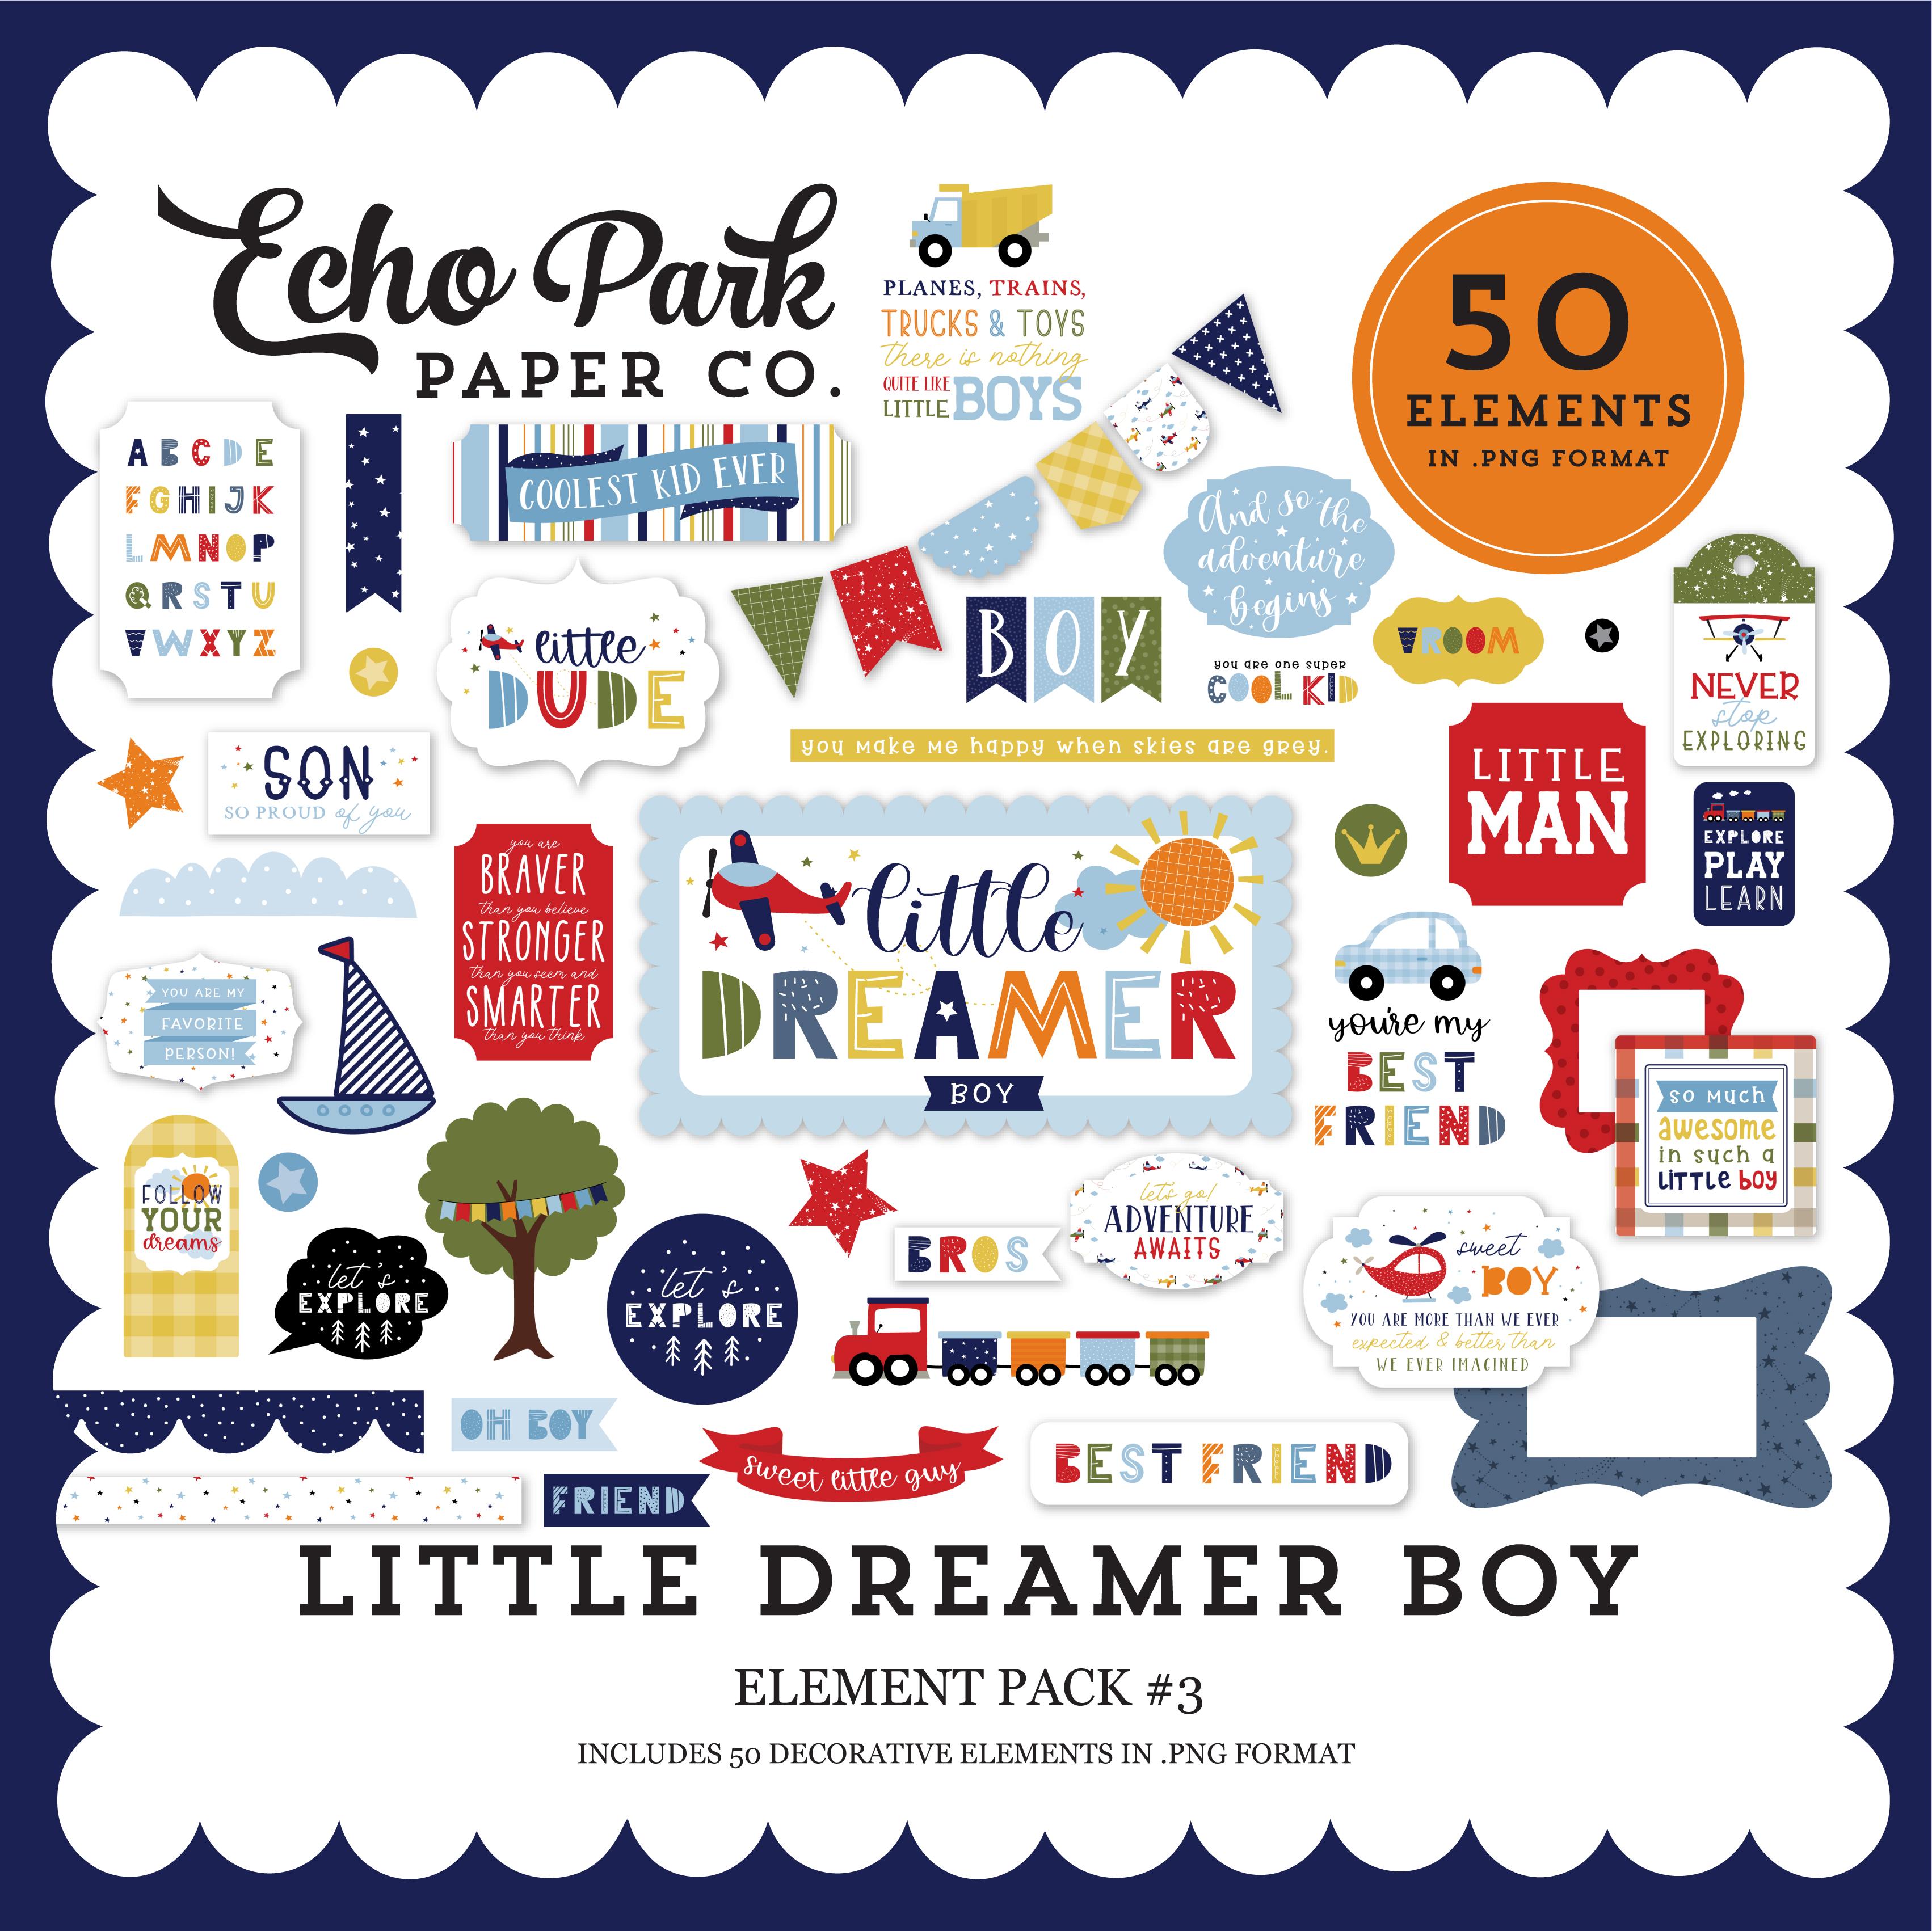 Little Dreamer Boy Element Pack #3